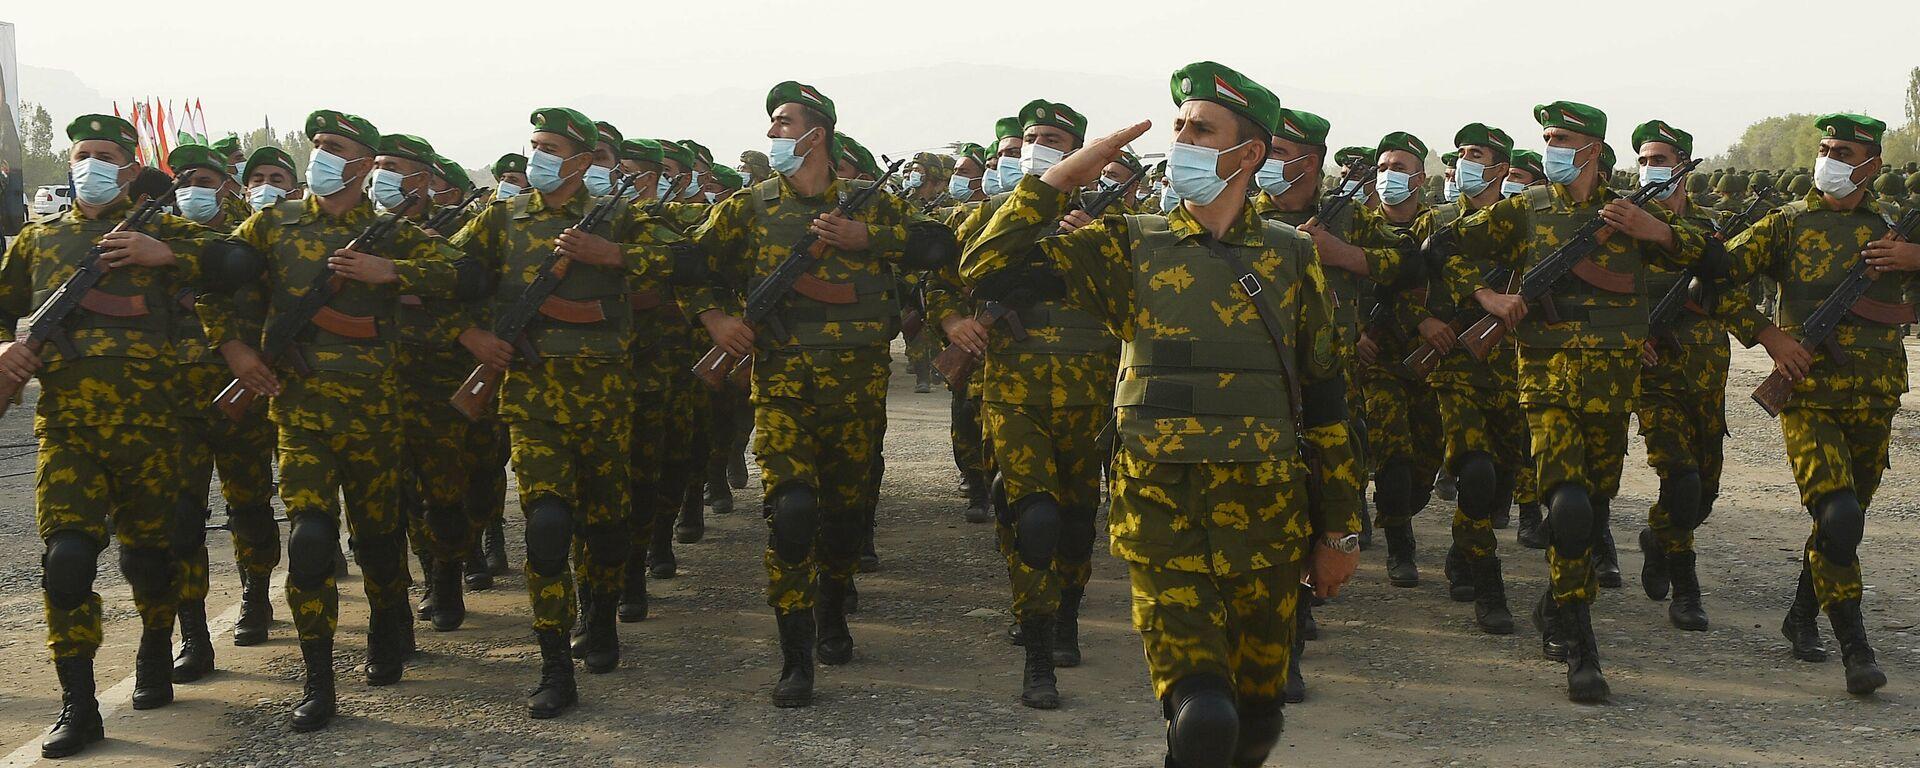 Военнослужащие армии Таджикистана - Sputnik Таджикистан, 1920, 16.07.2021